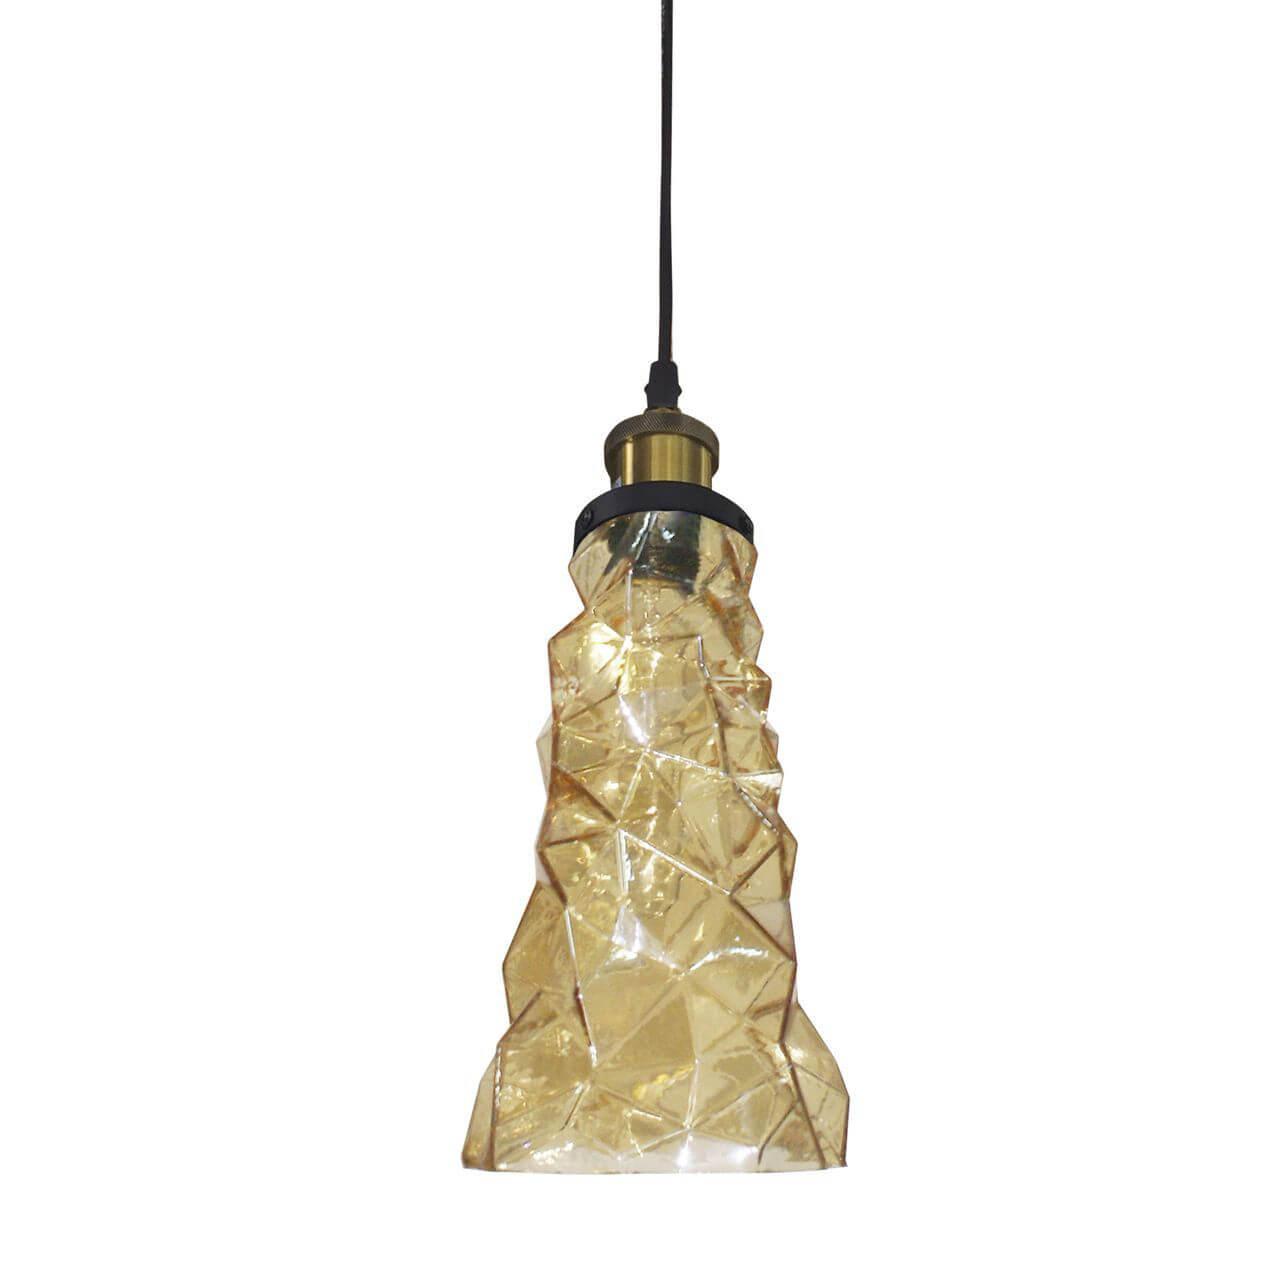 цена на Светильник Kink Light 091079-1 Ласло